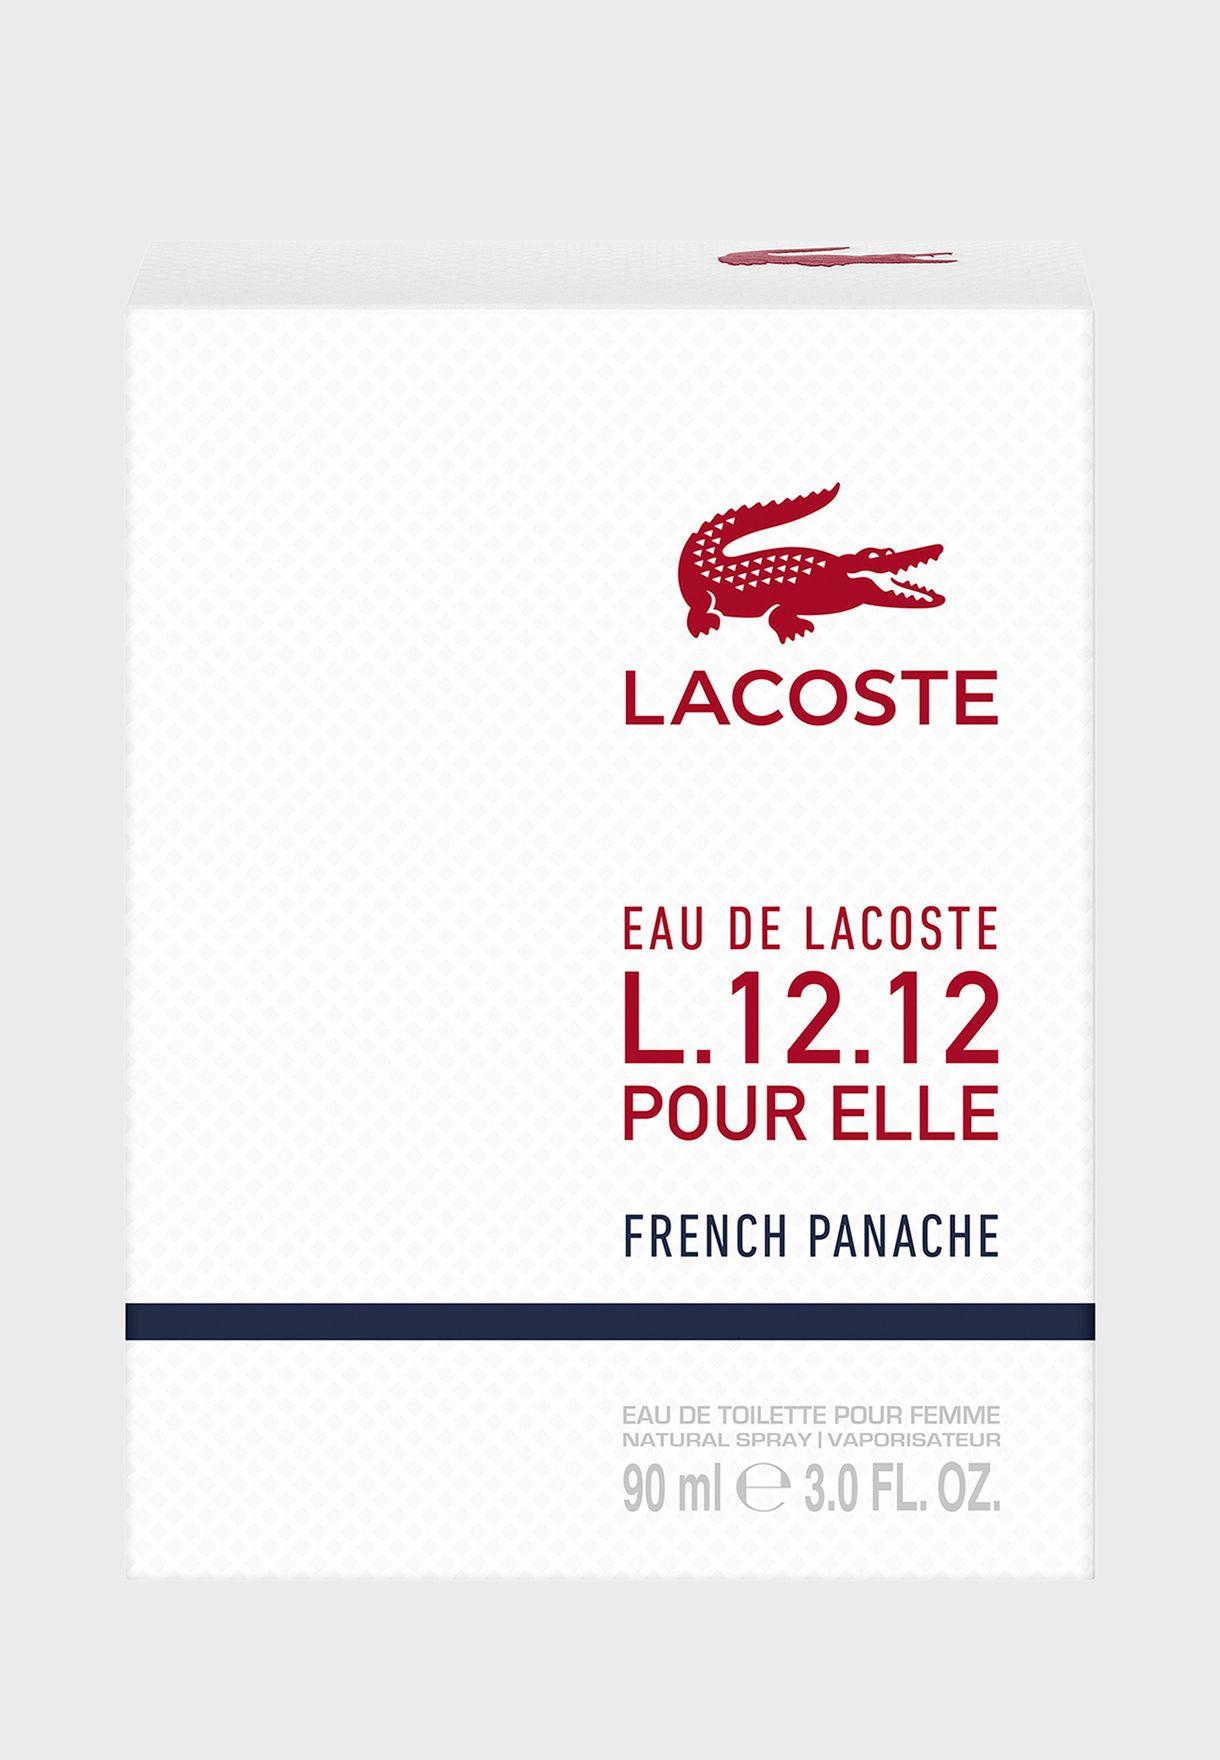 عطر ل.۱٢.۱٢ فرنش بناش للرجال أو دو تواليت 100مل